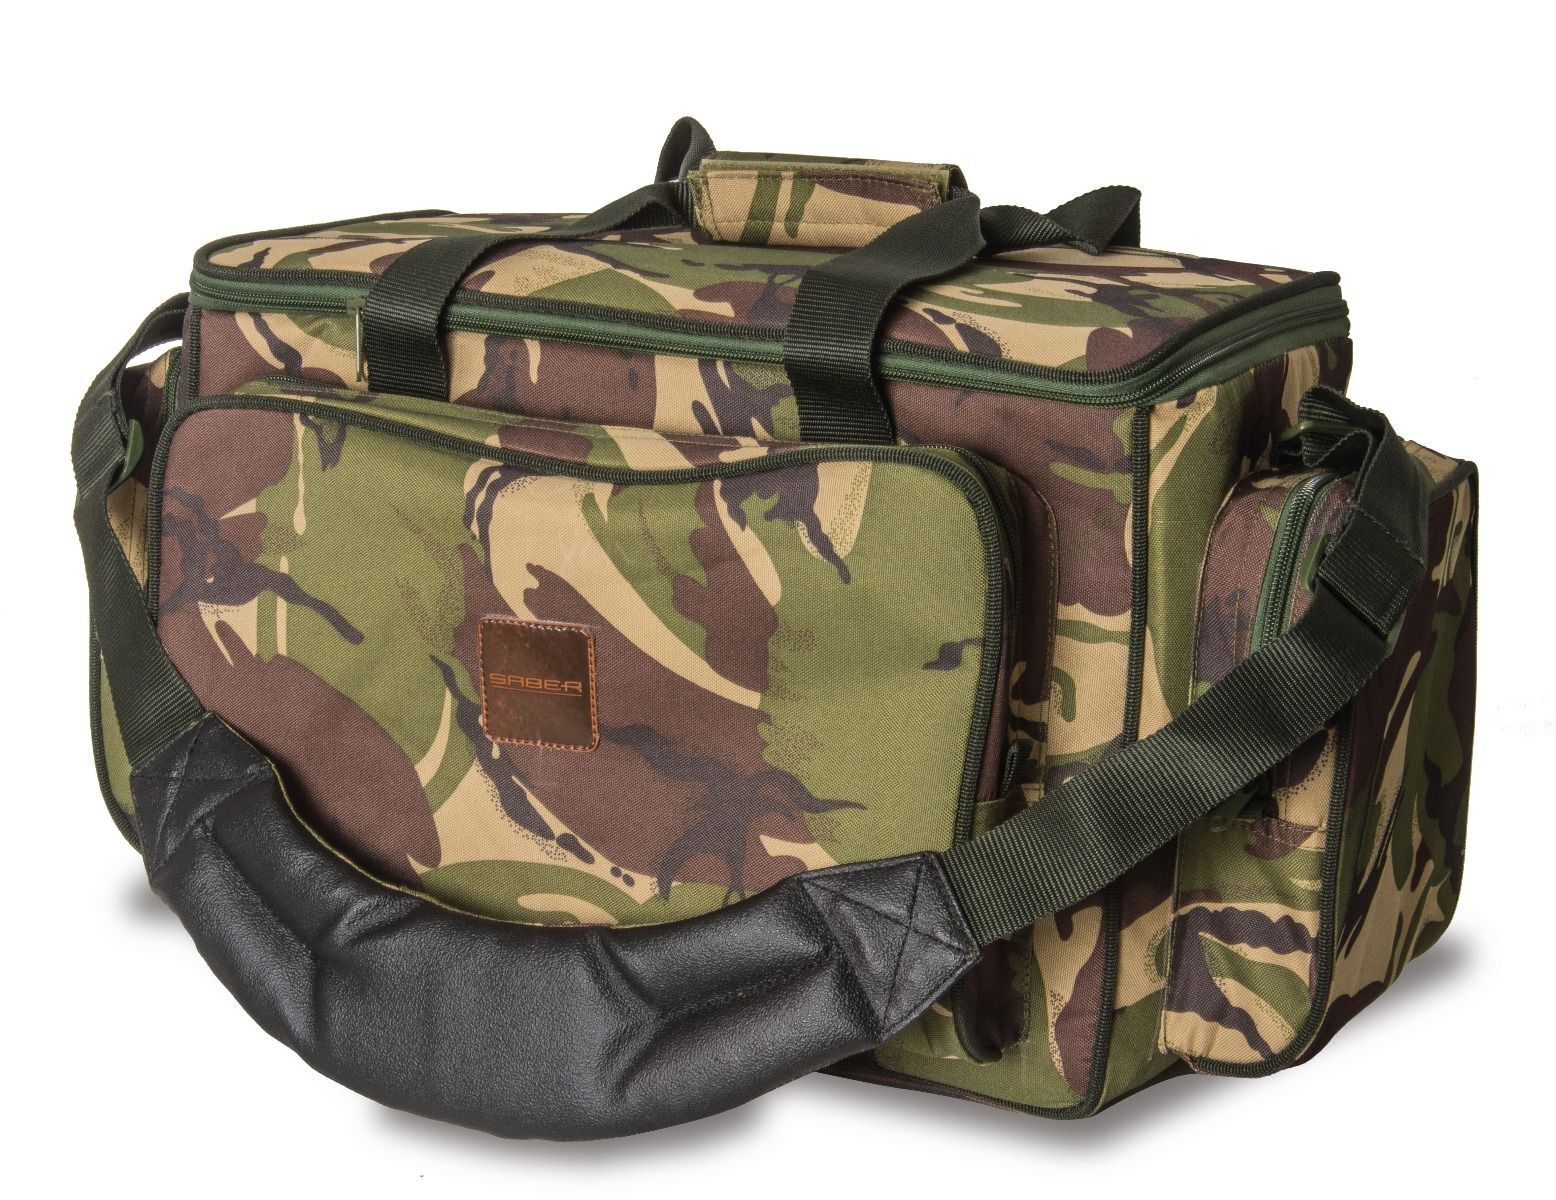 Saber Fishing Tackle DPM Camo Medium Carryall / Bag Carp Luggage for bait reels